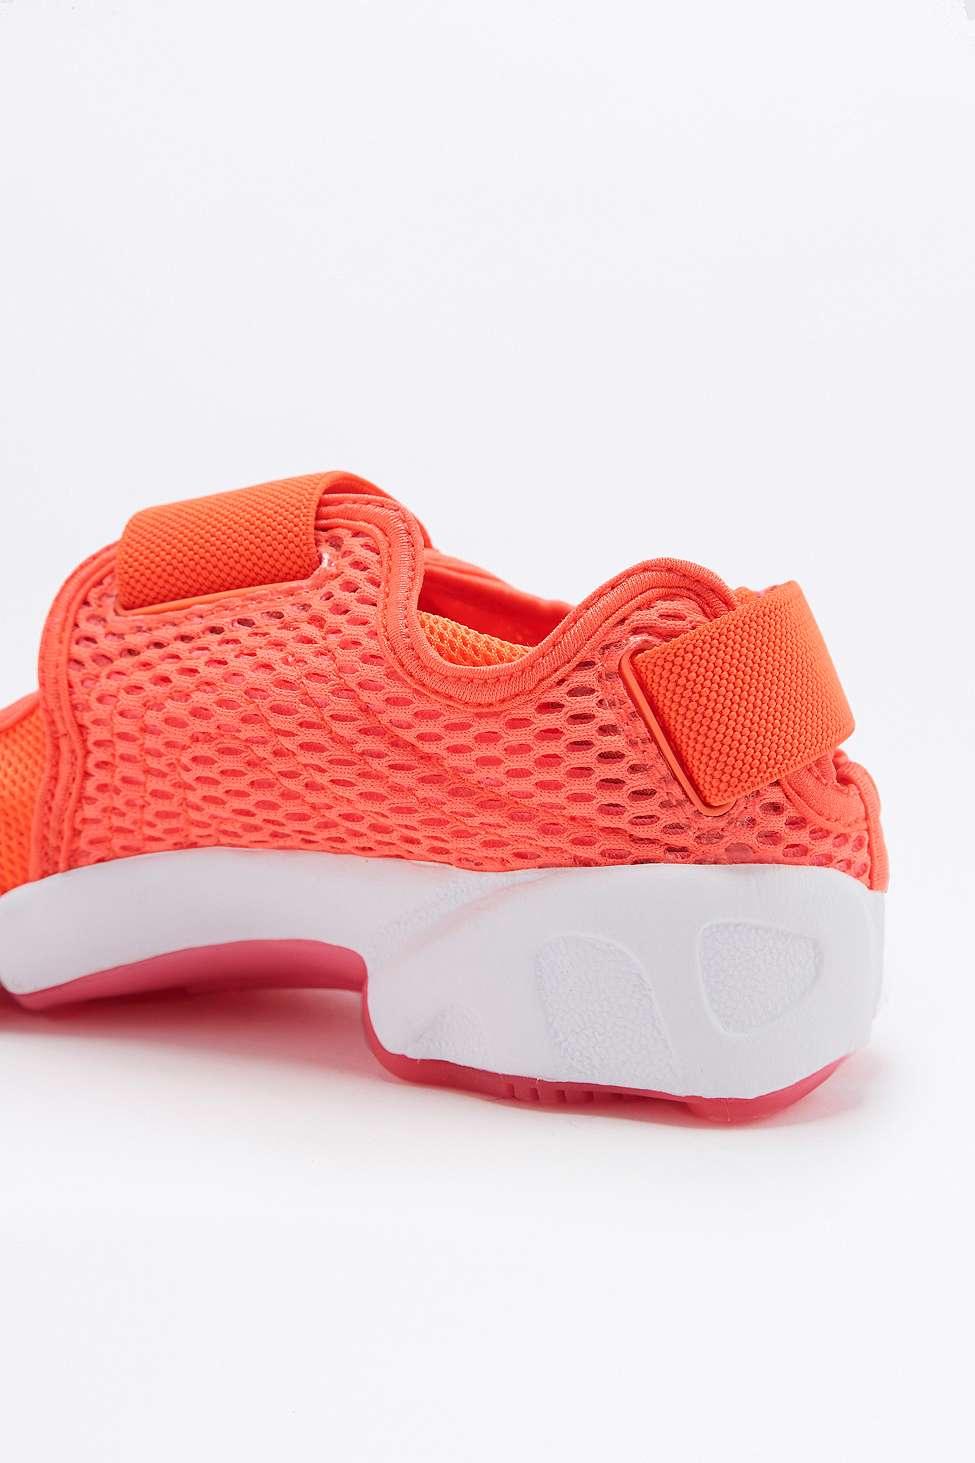 Nike Air Rift Coral Trainers